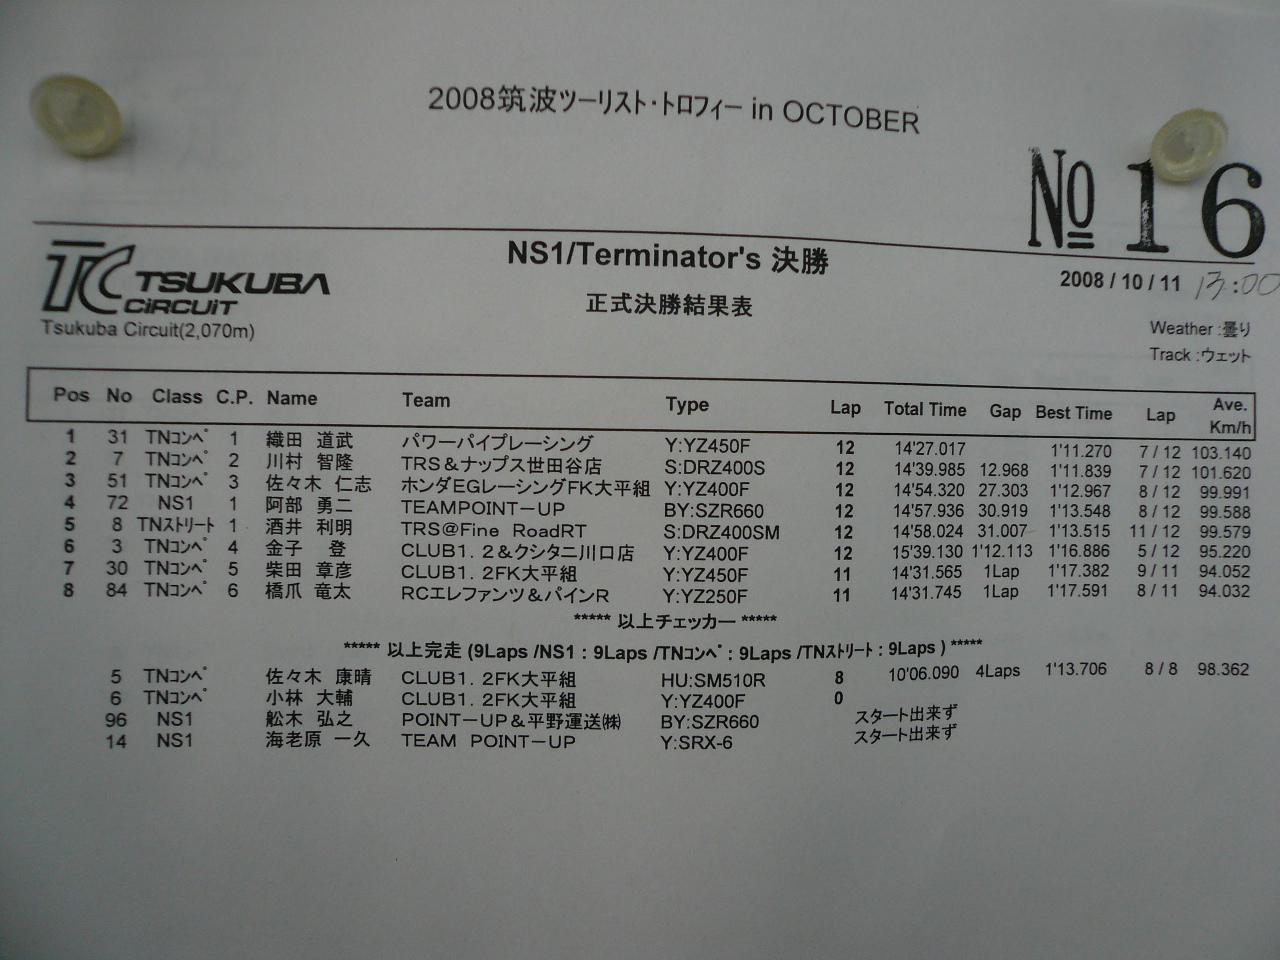 http://img.blogs.yahoo.co.jp/ybi/1/13/f5/tetsutaro499/folder/1580910/img_1580910_44649232_2?1223735396